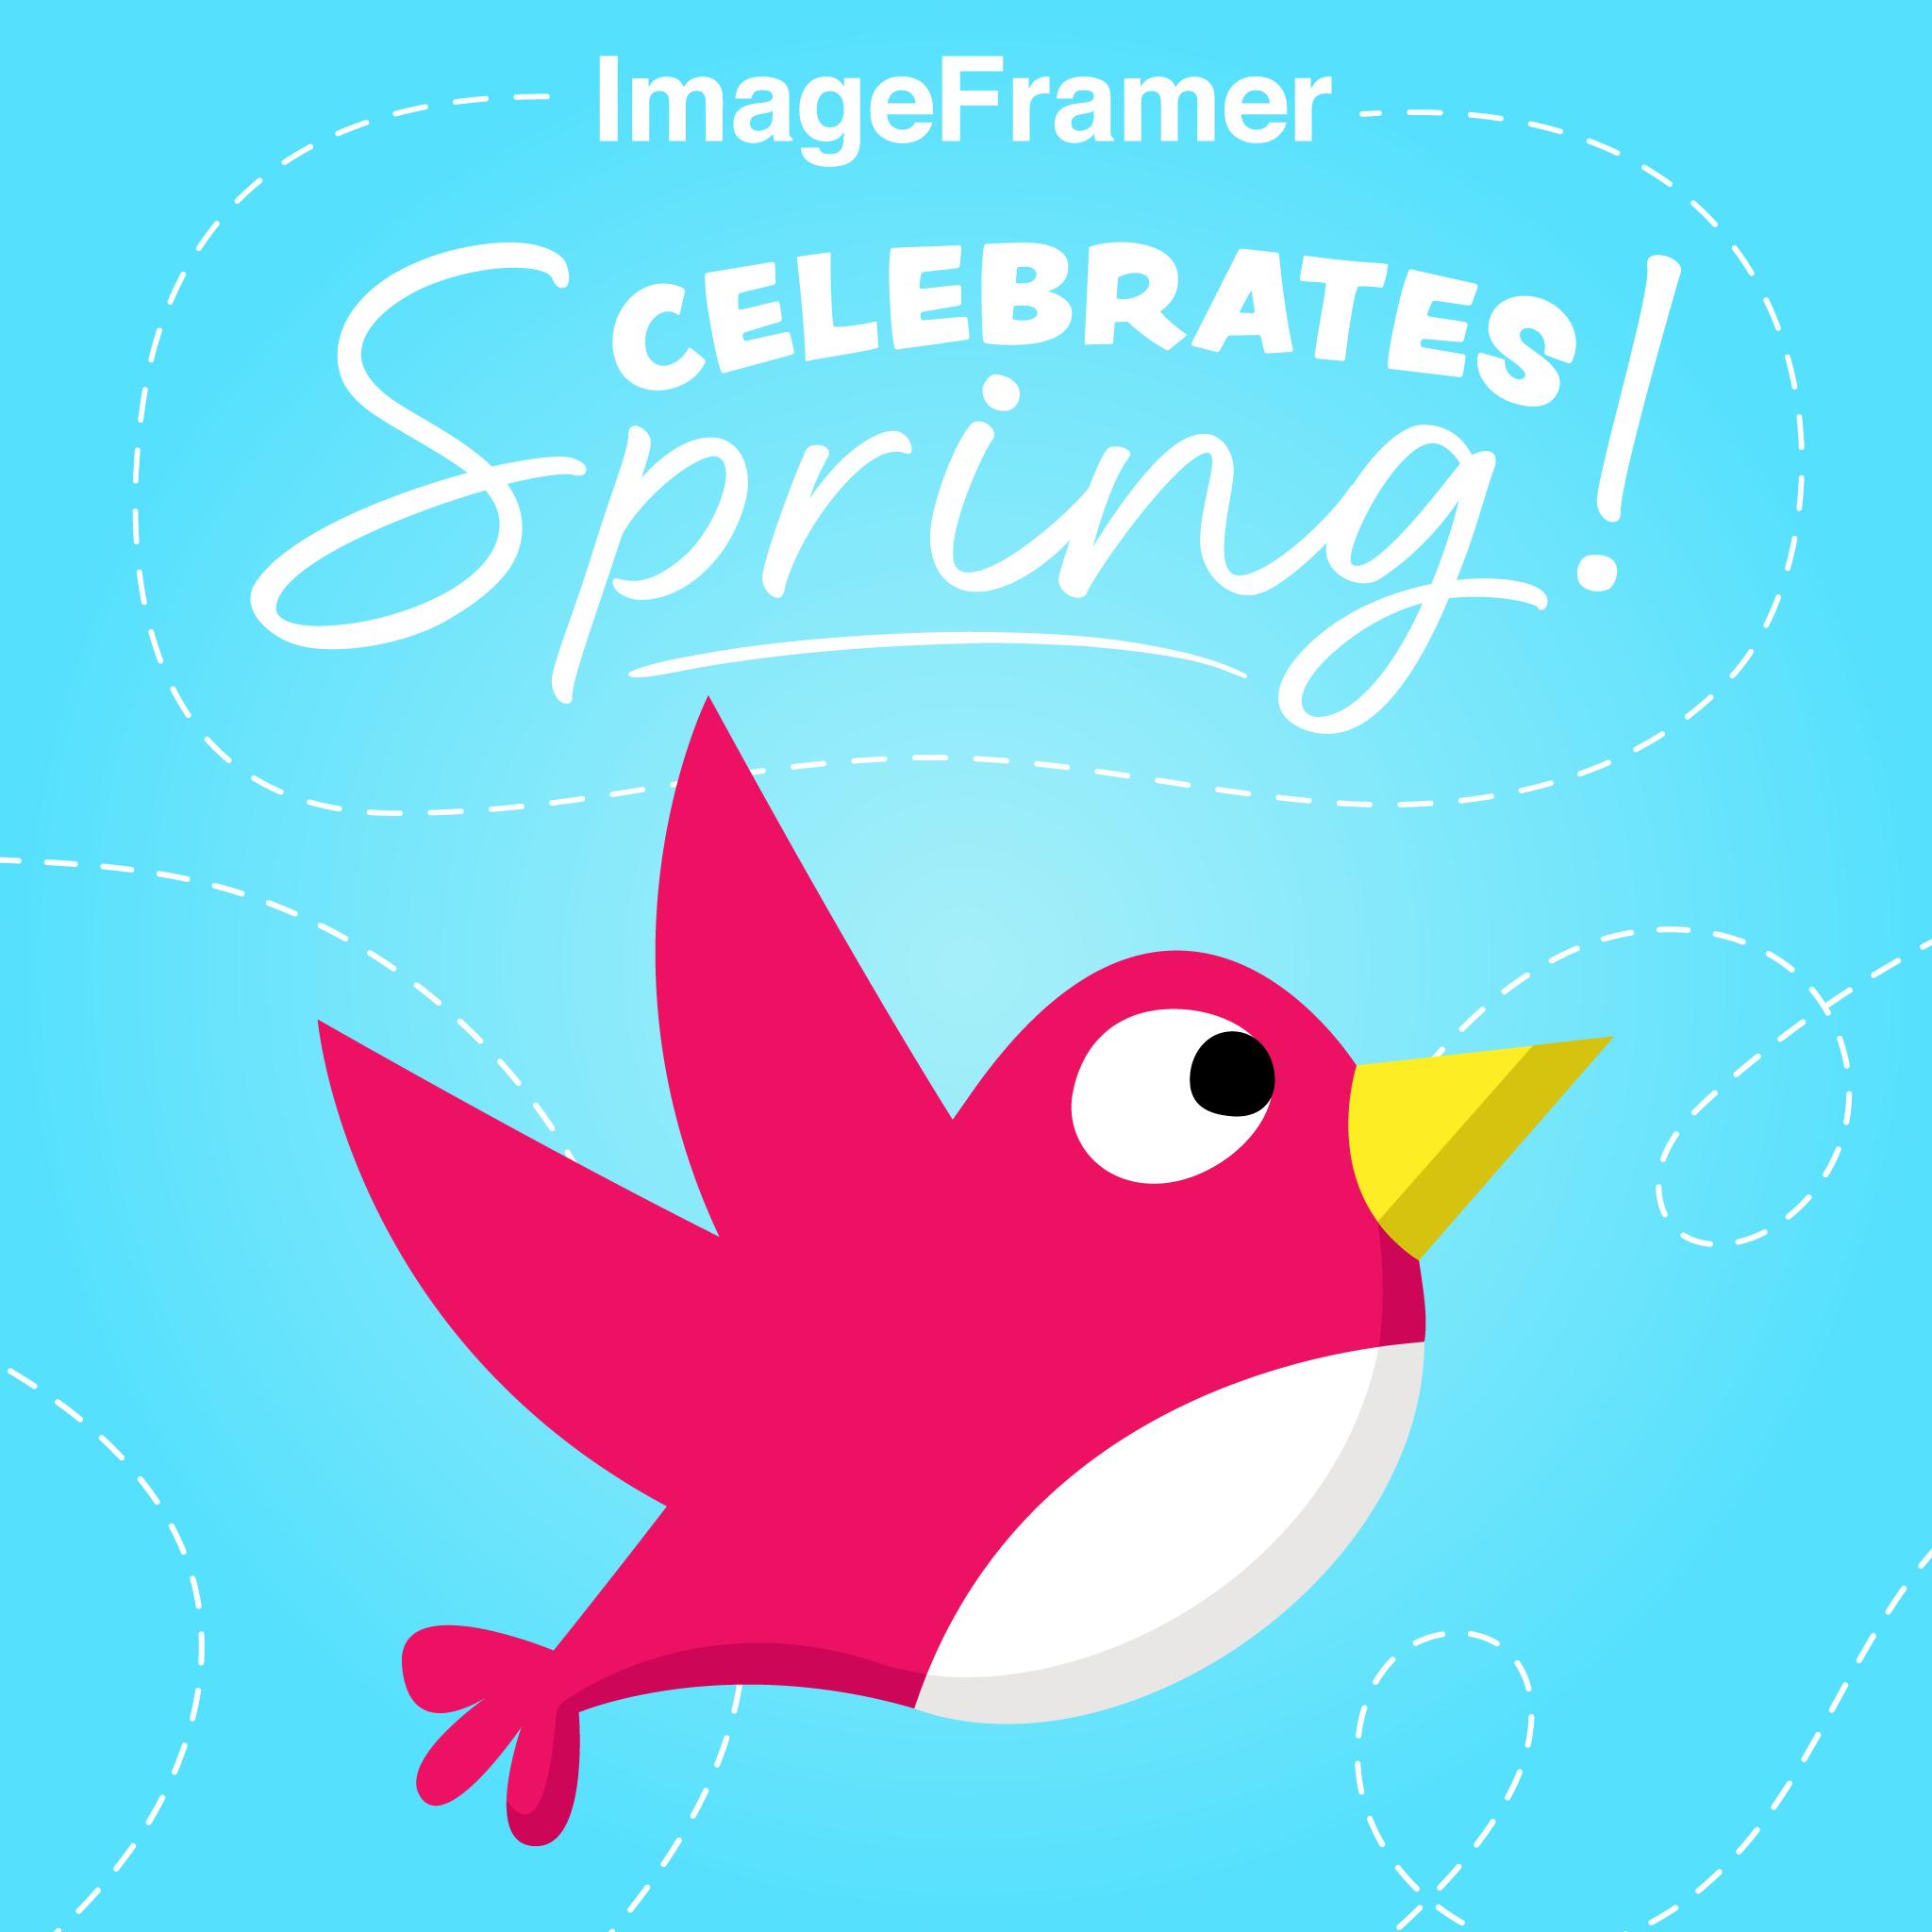 Introducing the ImageFramer Celebrates Spring Sticker Pack